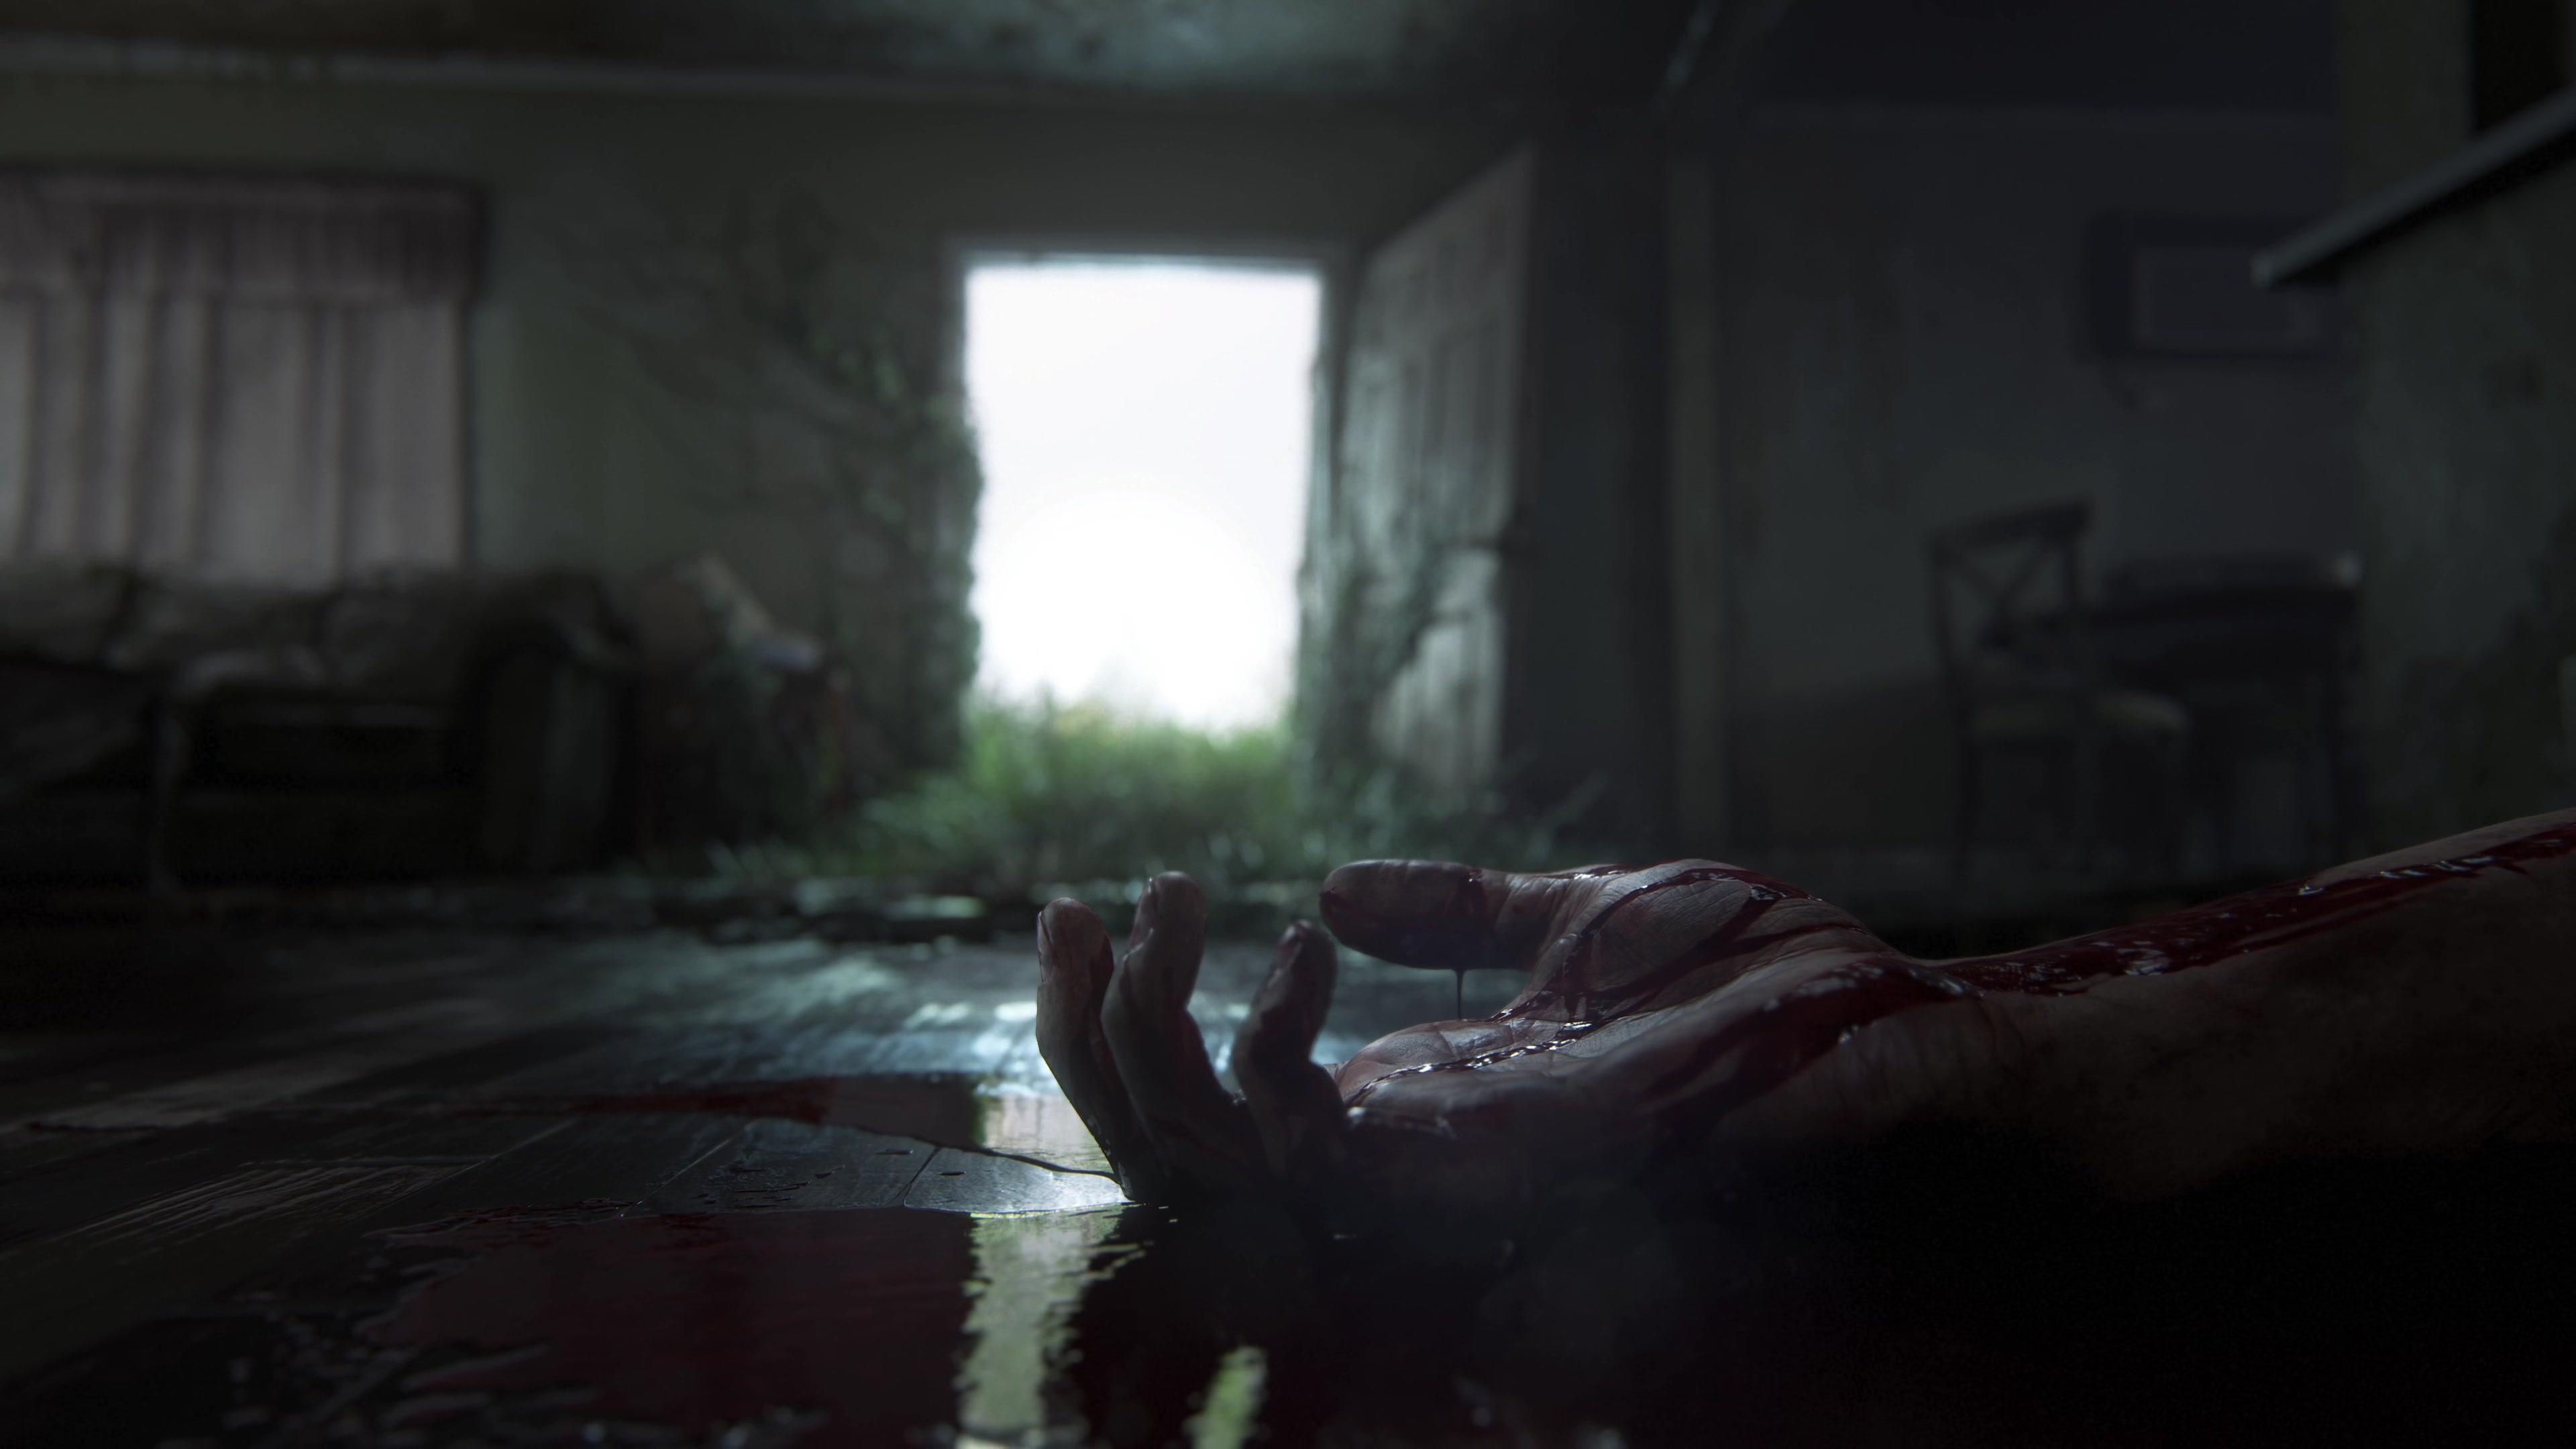 The last of us 2 00 124.jpg - Last of Us: Part 2, the